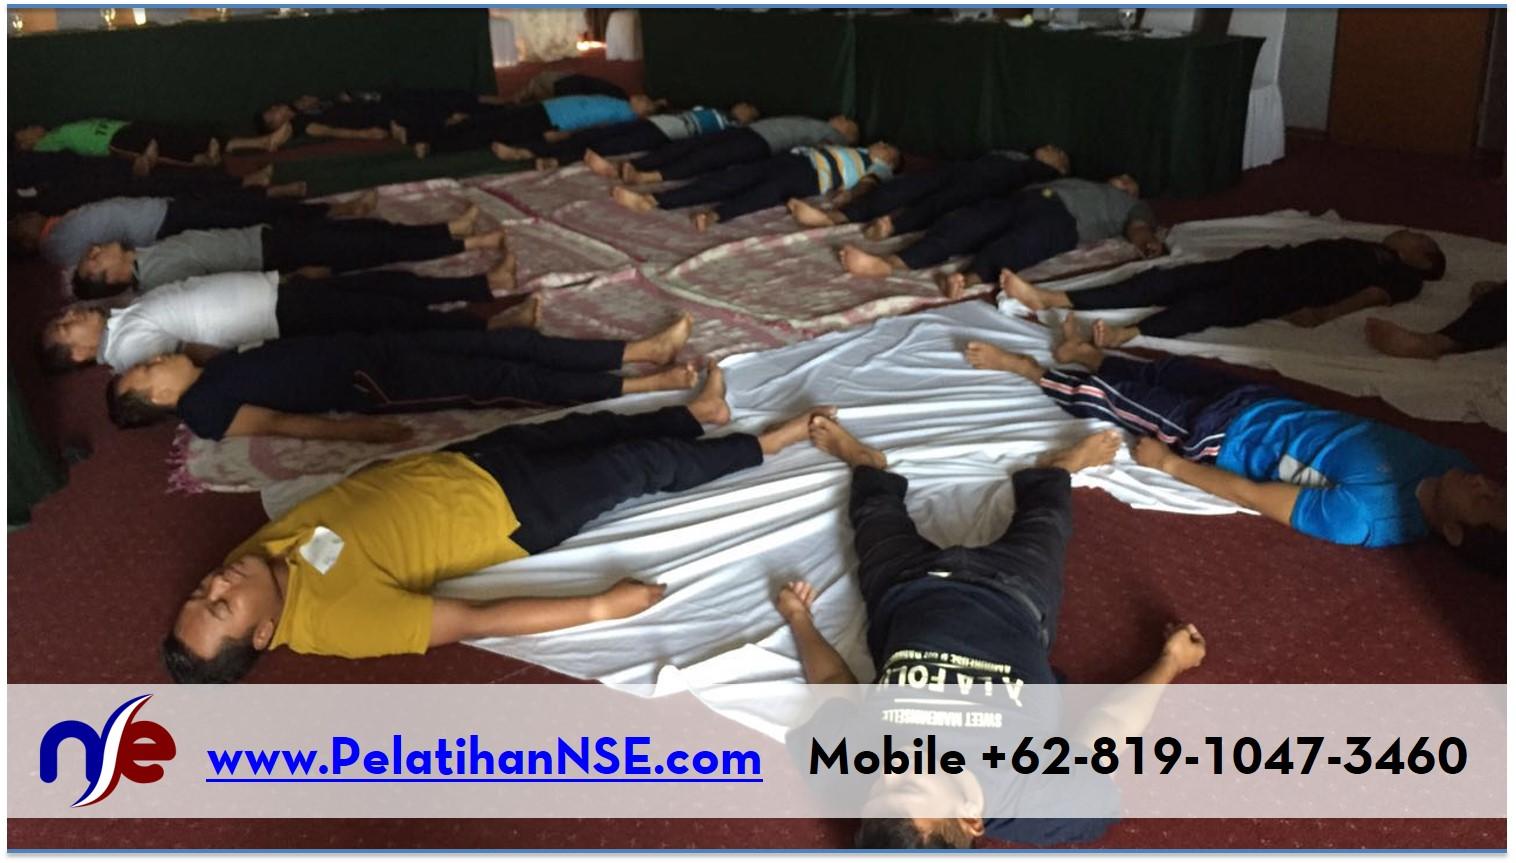 NSE Basic Self Empowerment KAI 1-2 Agustus 2016 - Rileksasi setelah TherFA